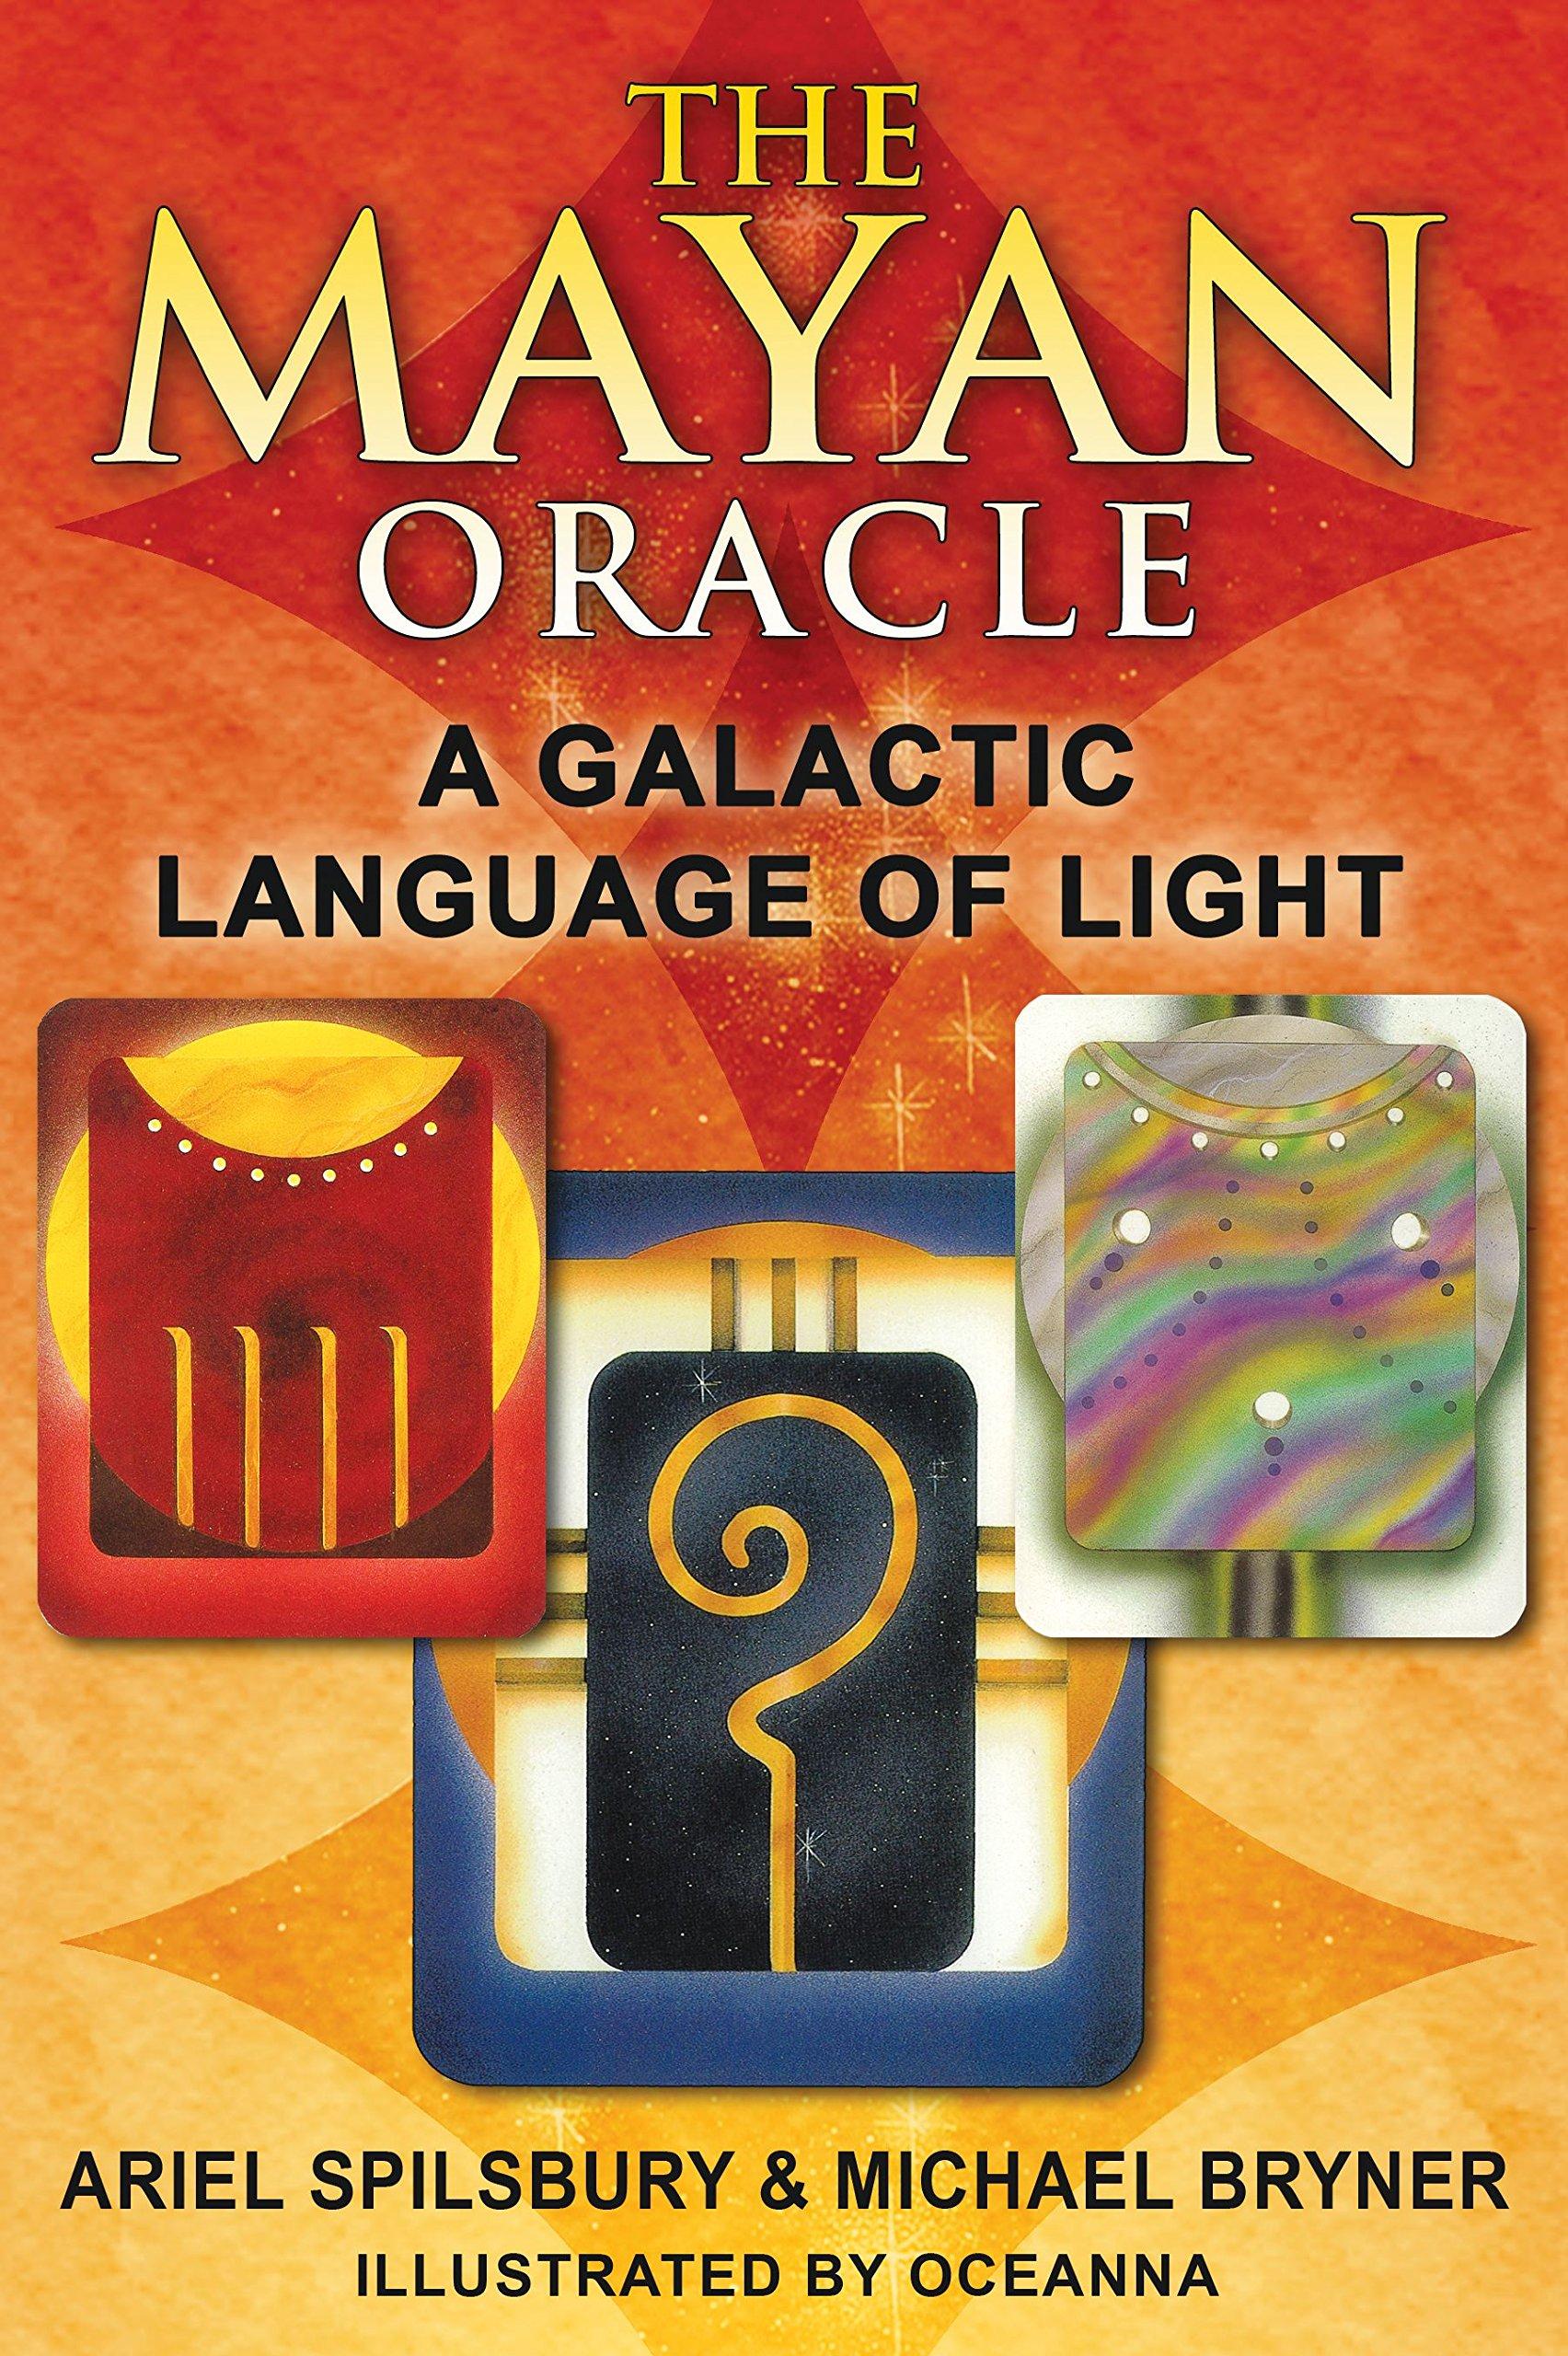 The Mayan Oracle: A Galactic Language Of Light: Ariel Spilsbury, Michael  Bryner, Oceanna: 9781591431237: Amazon: Books